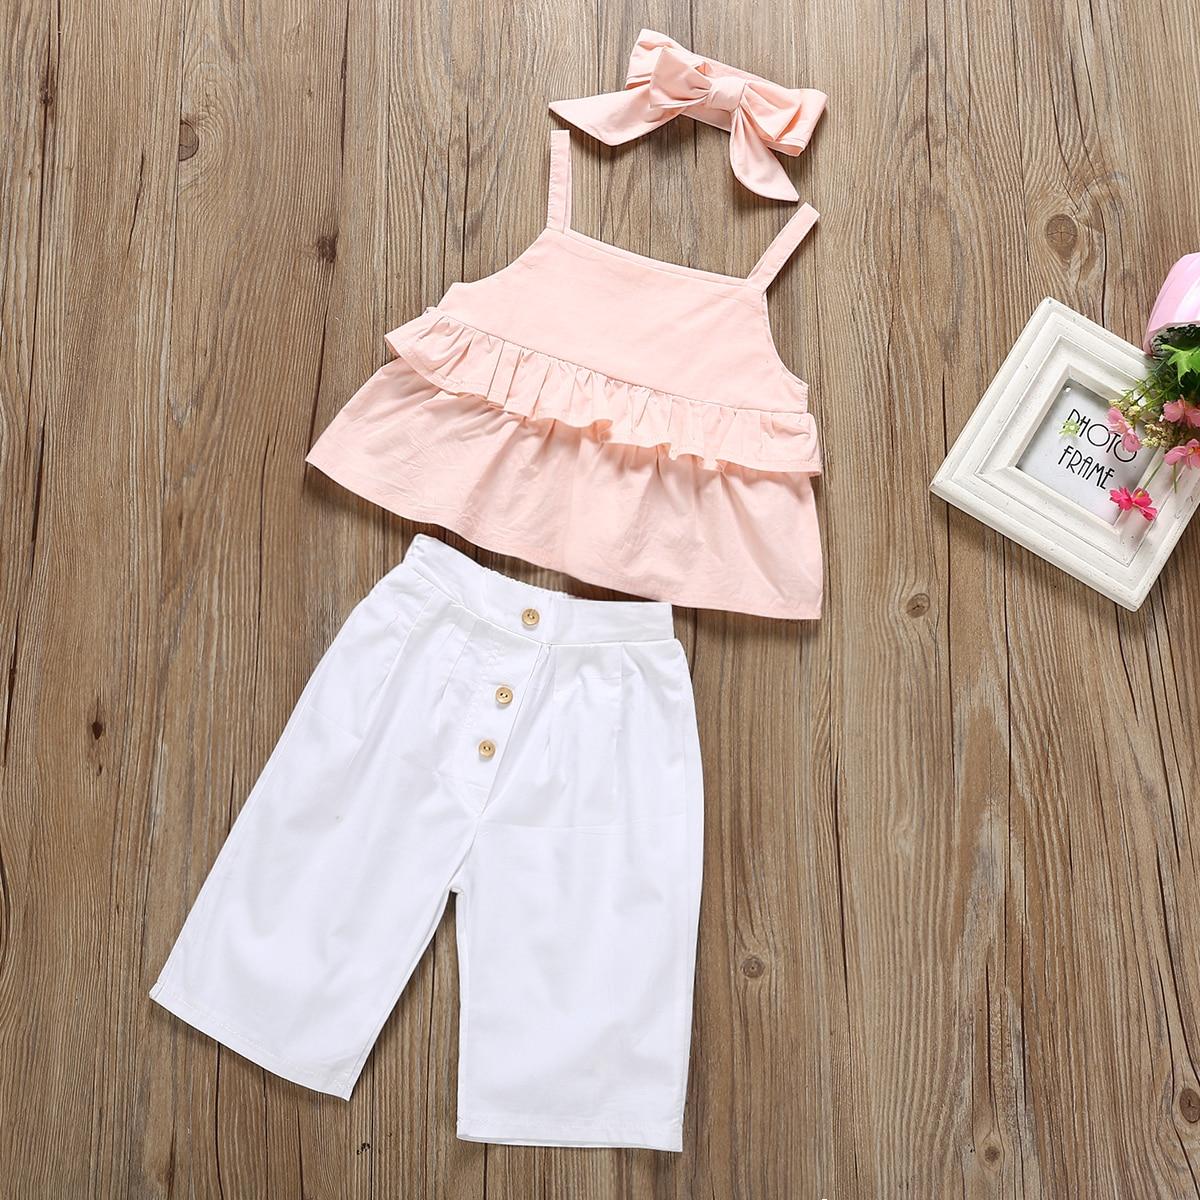 Toddler Kids Baby Girl Clothes Headband Sling Tops T-Shirt Dress 3PCS Outfit Set